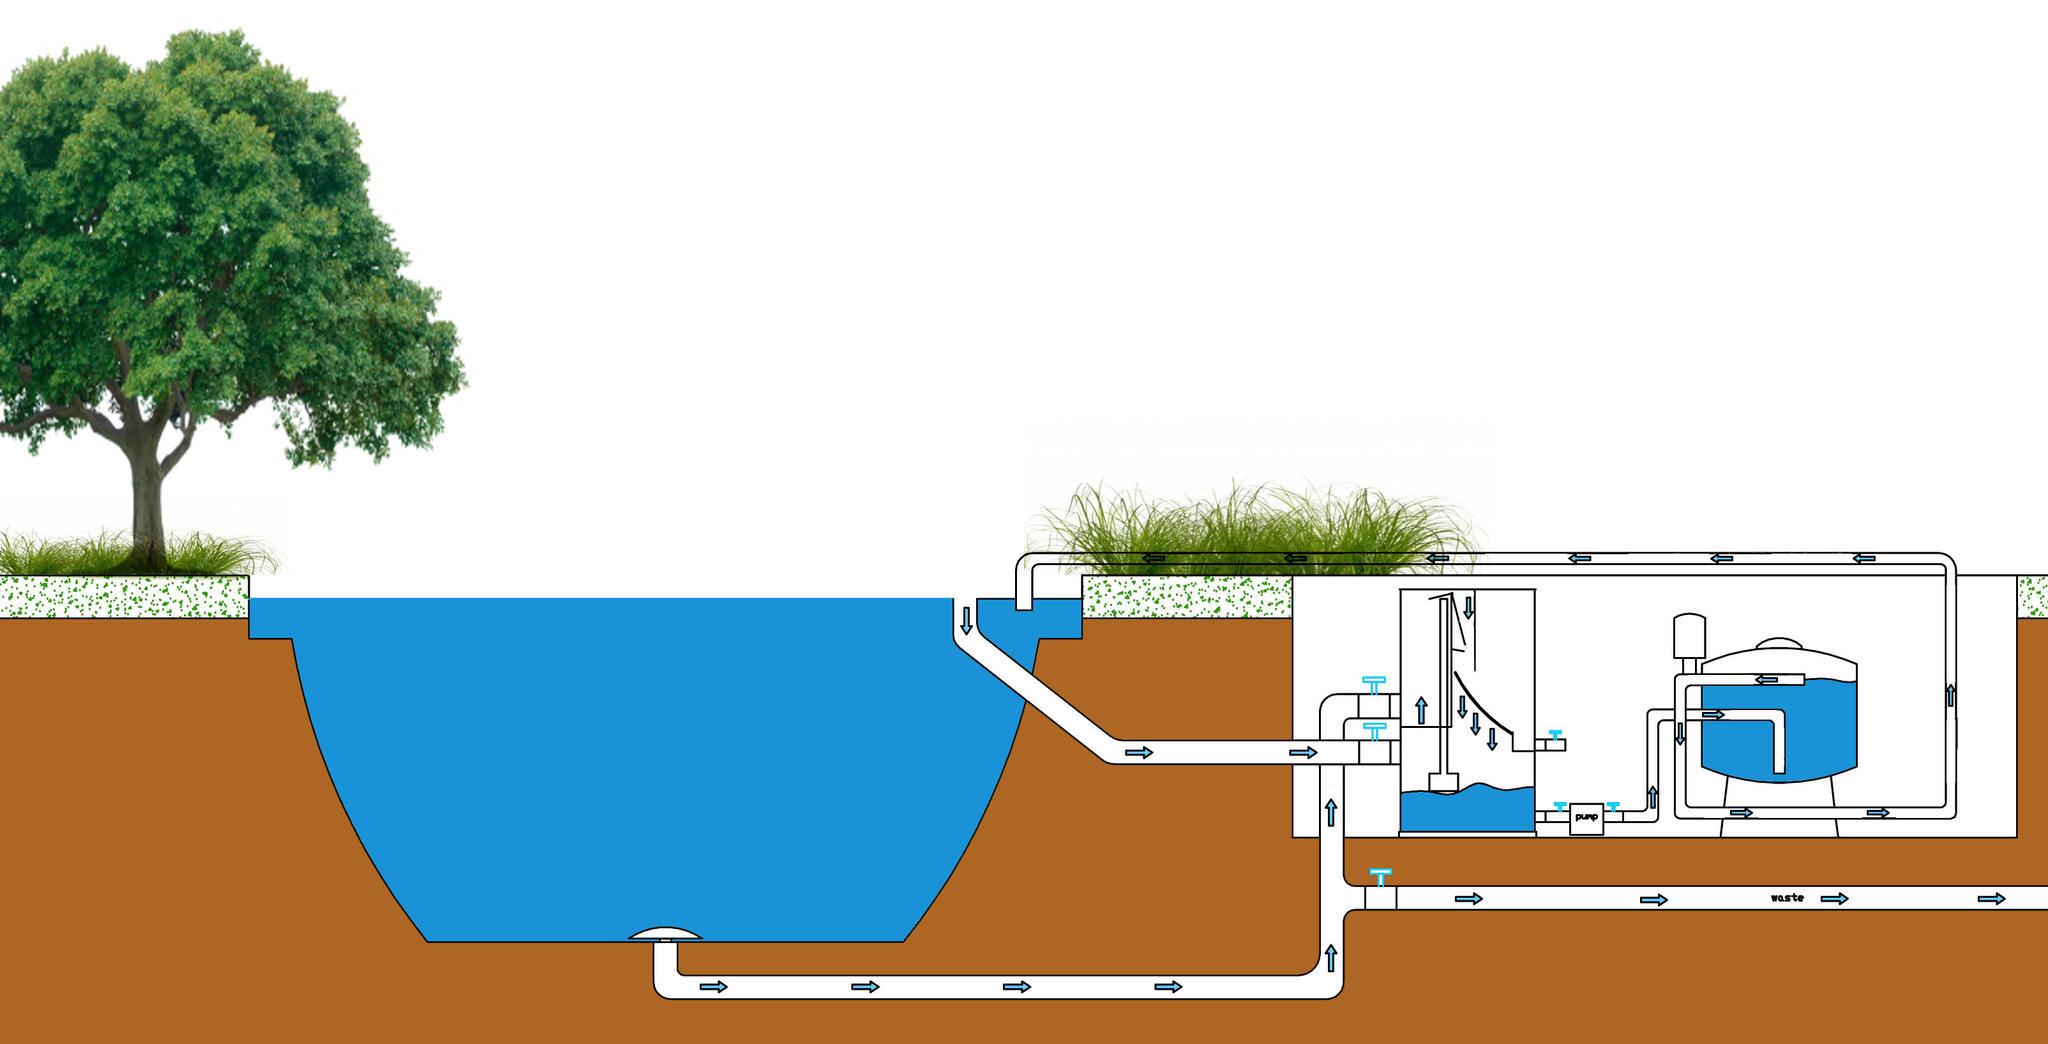 vijverfiltersysteem